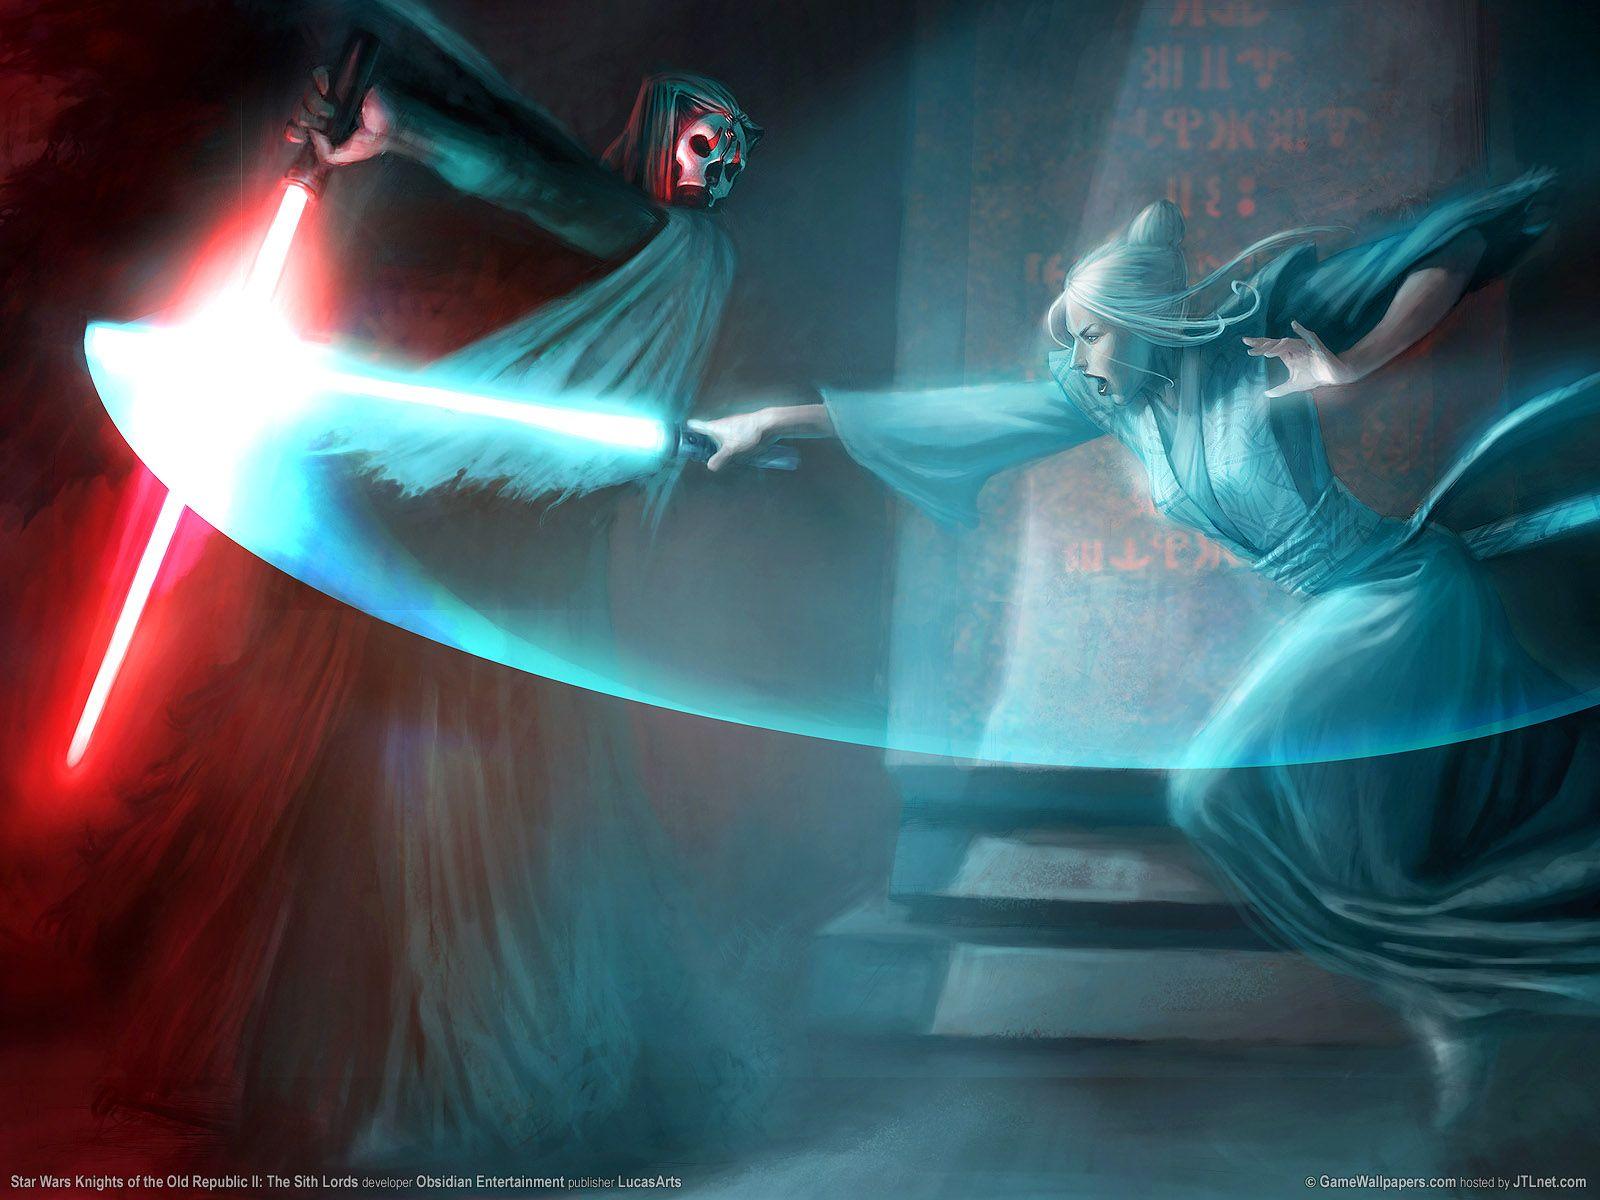 jedi vs sith lord | fantasy-digital art | pinterest | sith lord